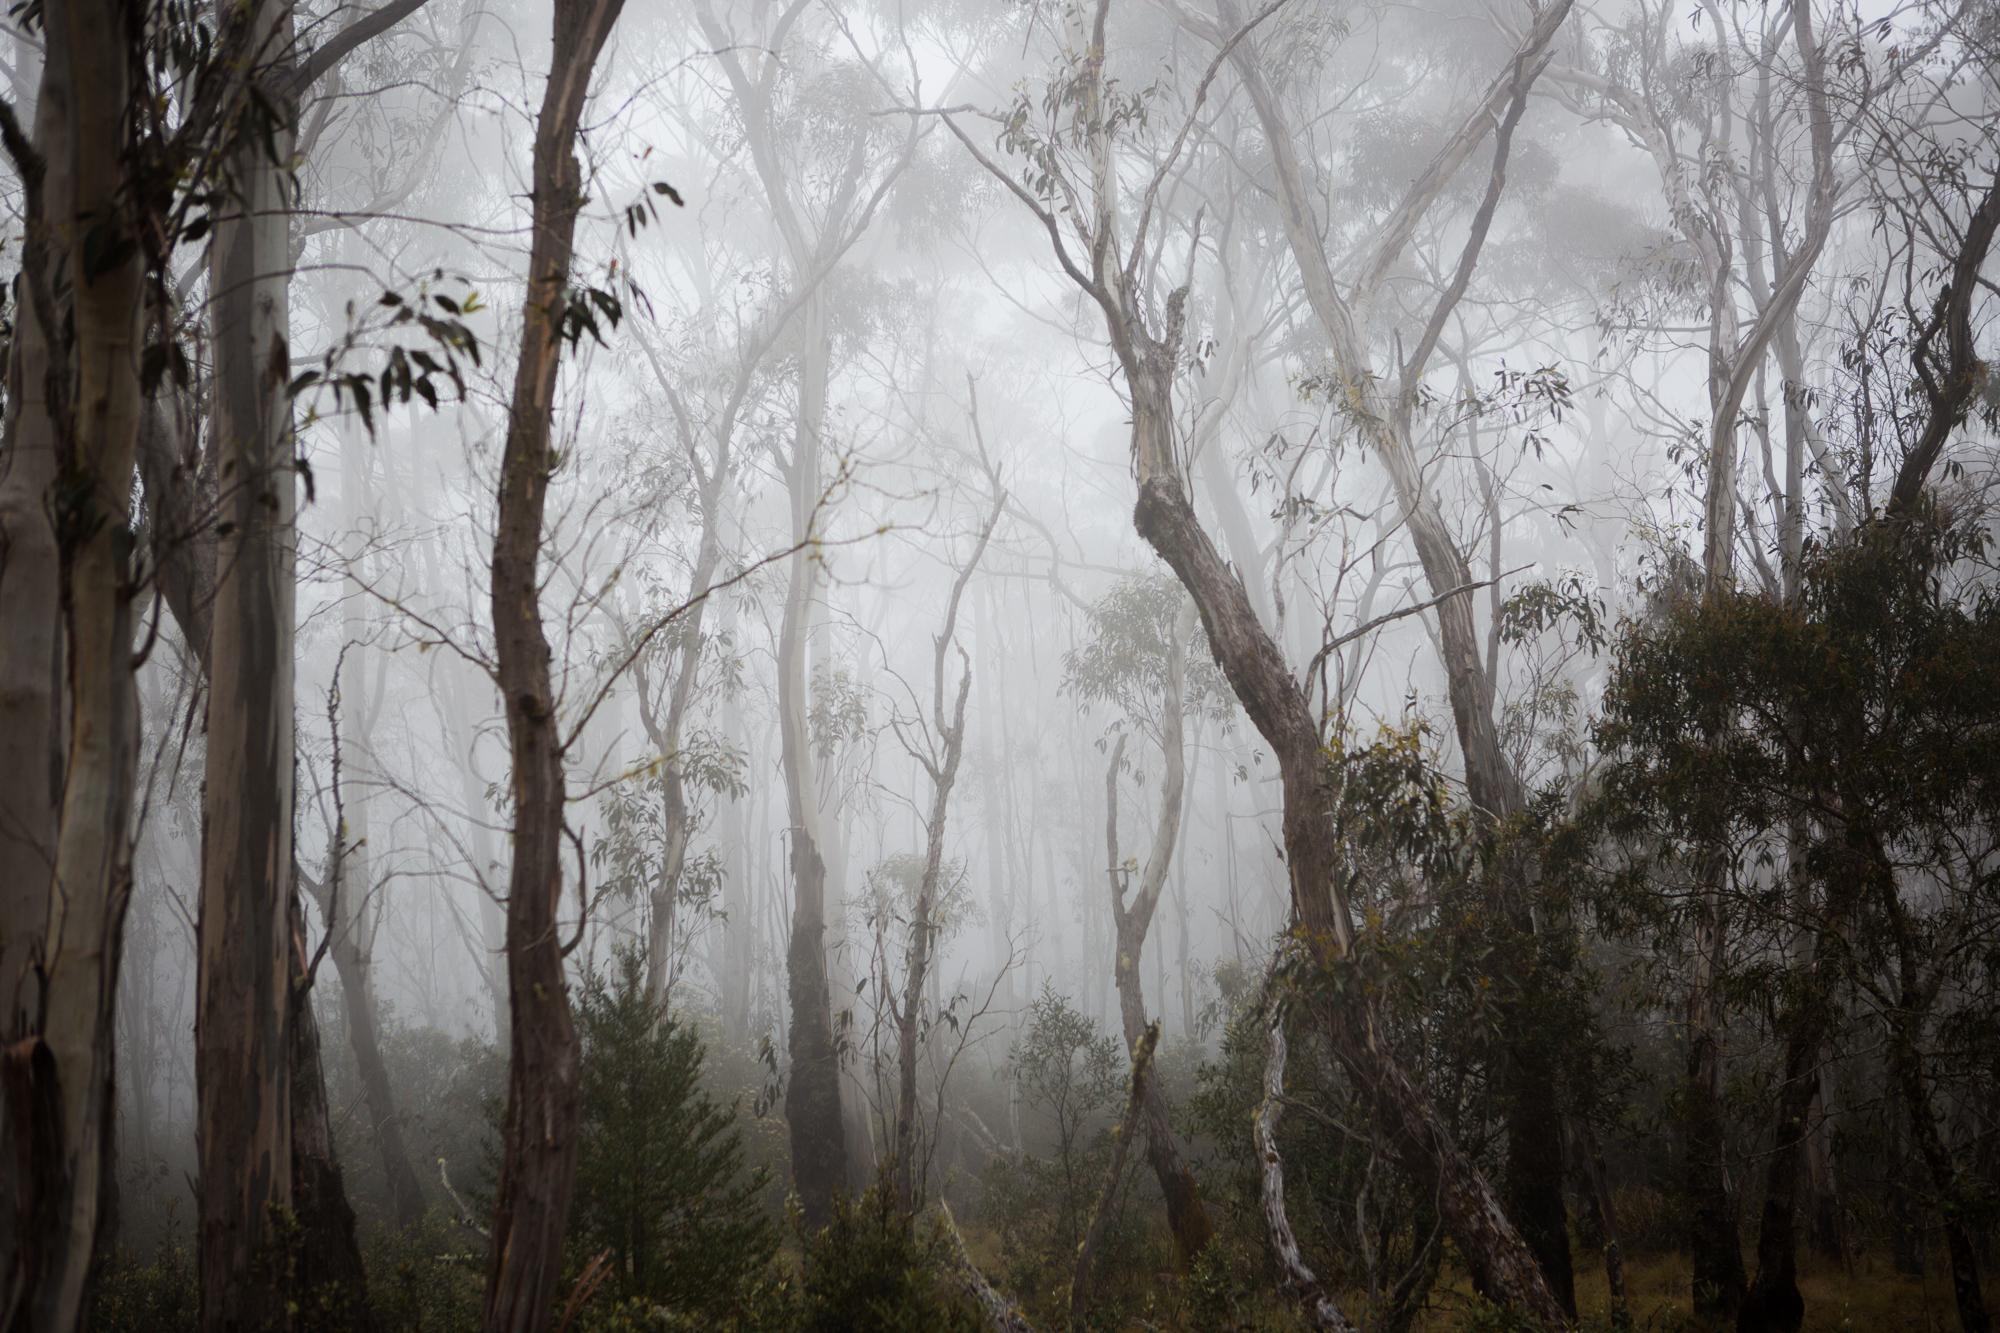 51-Bec_Kilpatrick_Photography_AustraliaBEC_8482